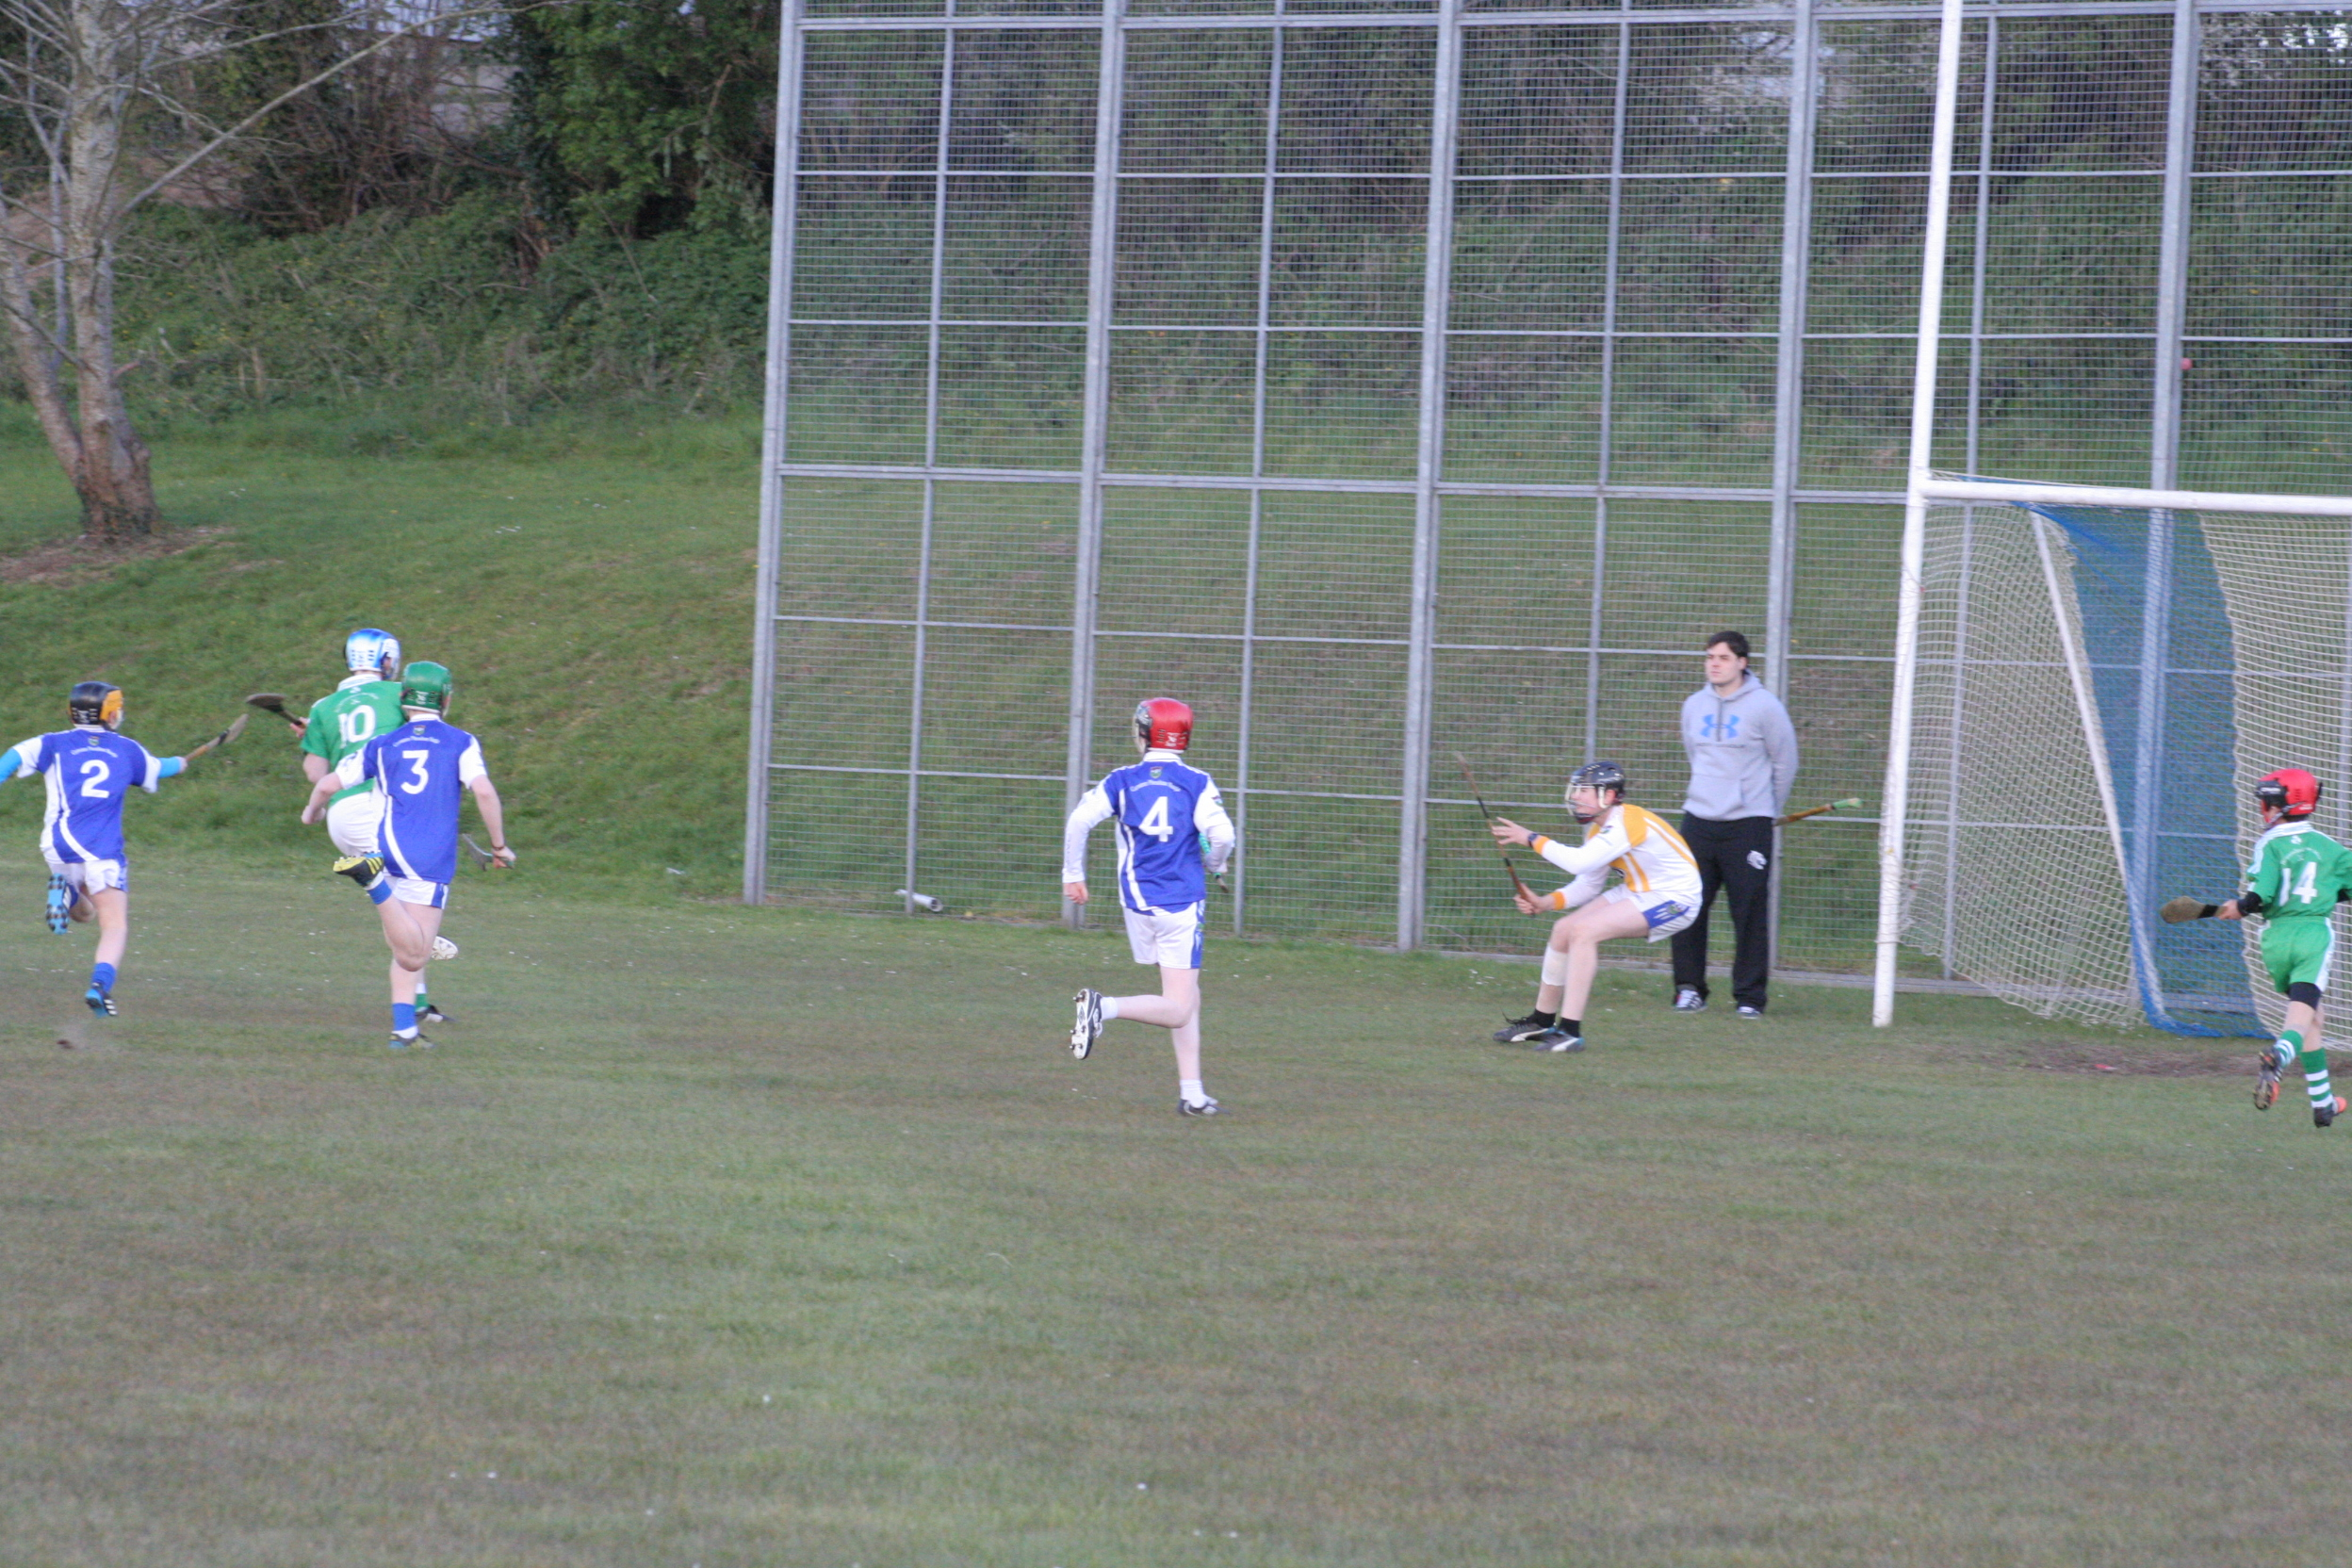 U14s narrow defeat to neighbours Shamrocks